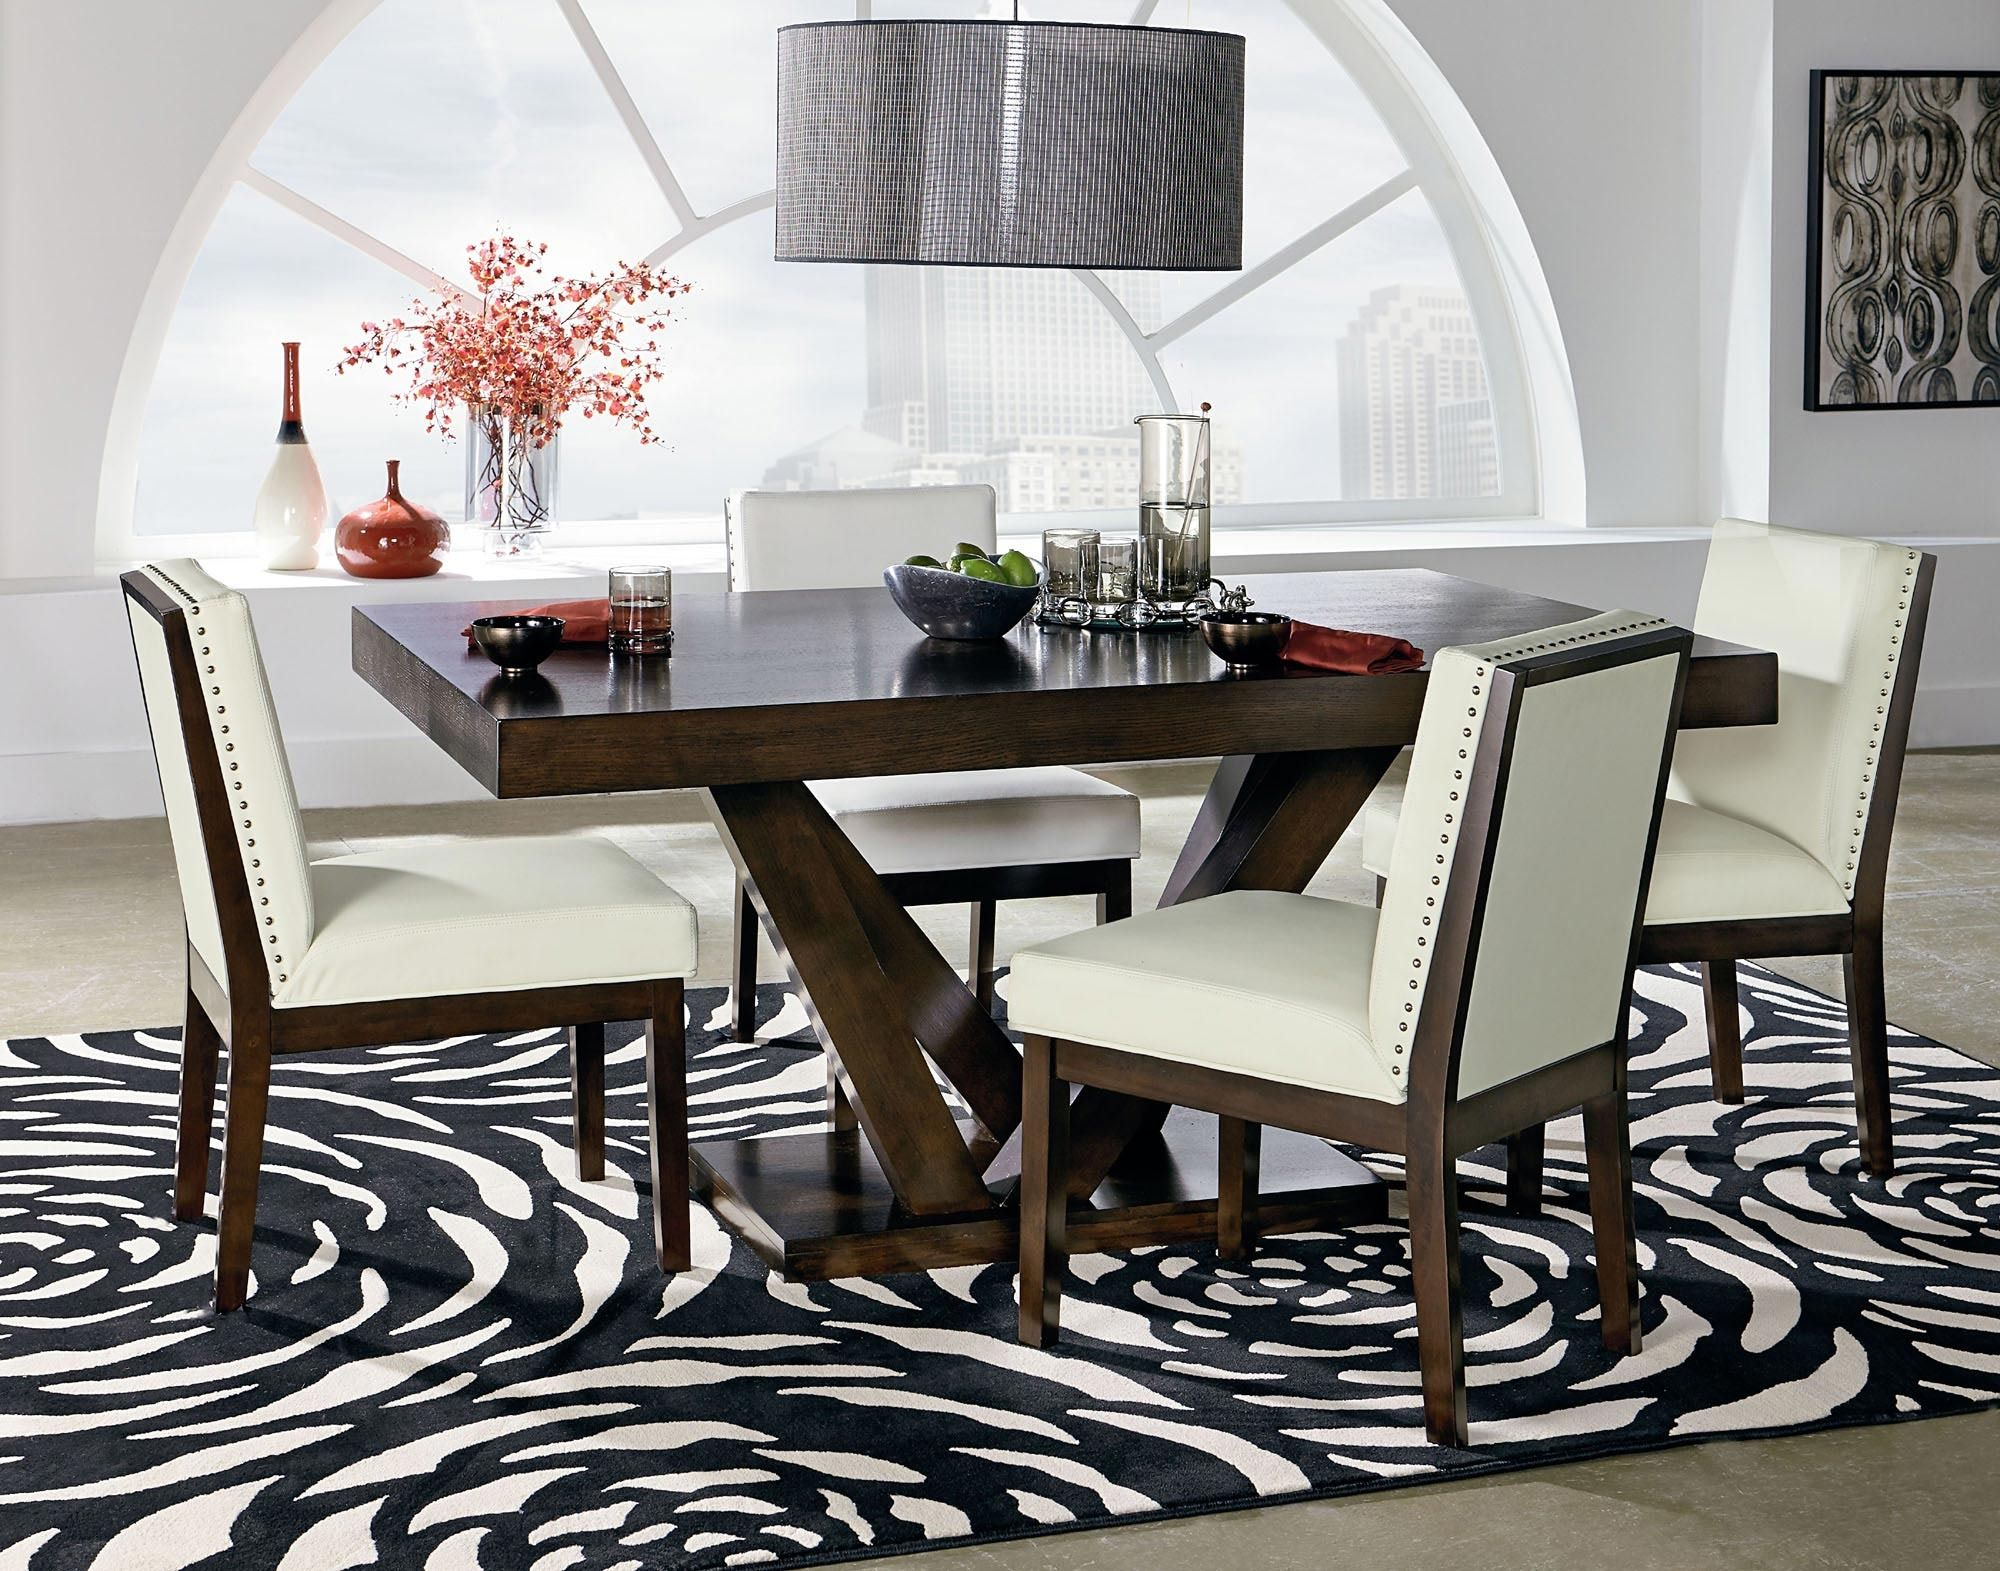 Couture Elegance Dining Pedestal Table   Standard Furniture   Home ...